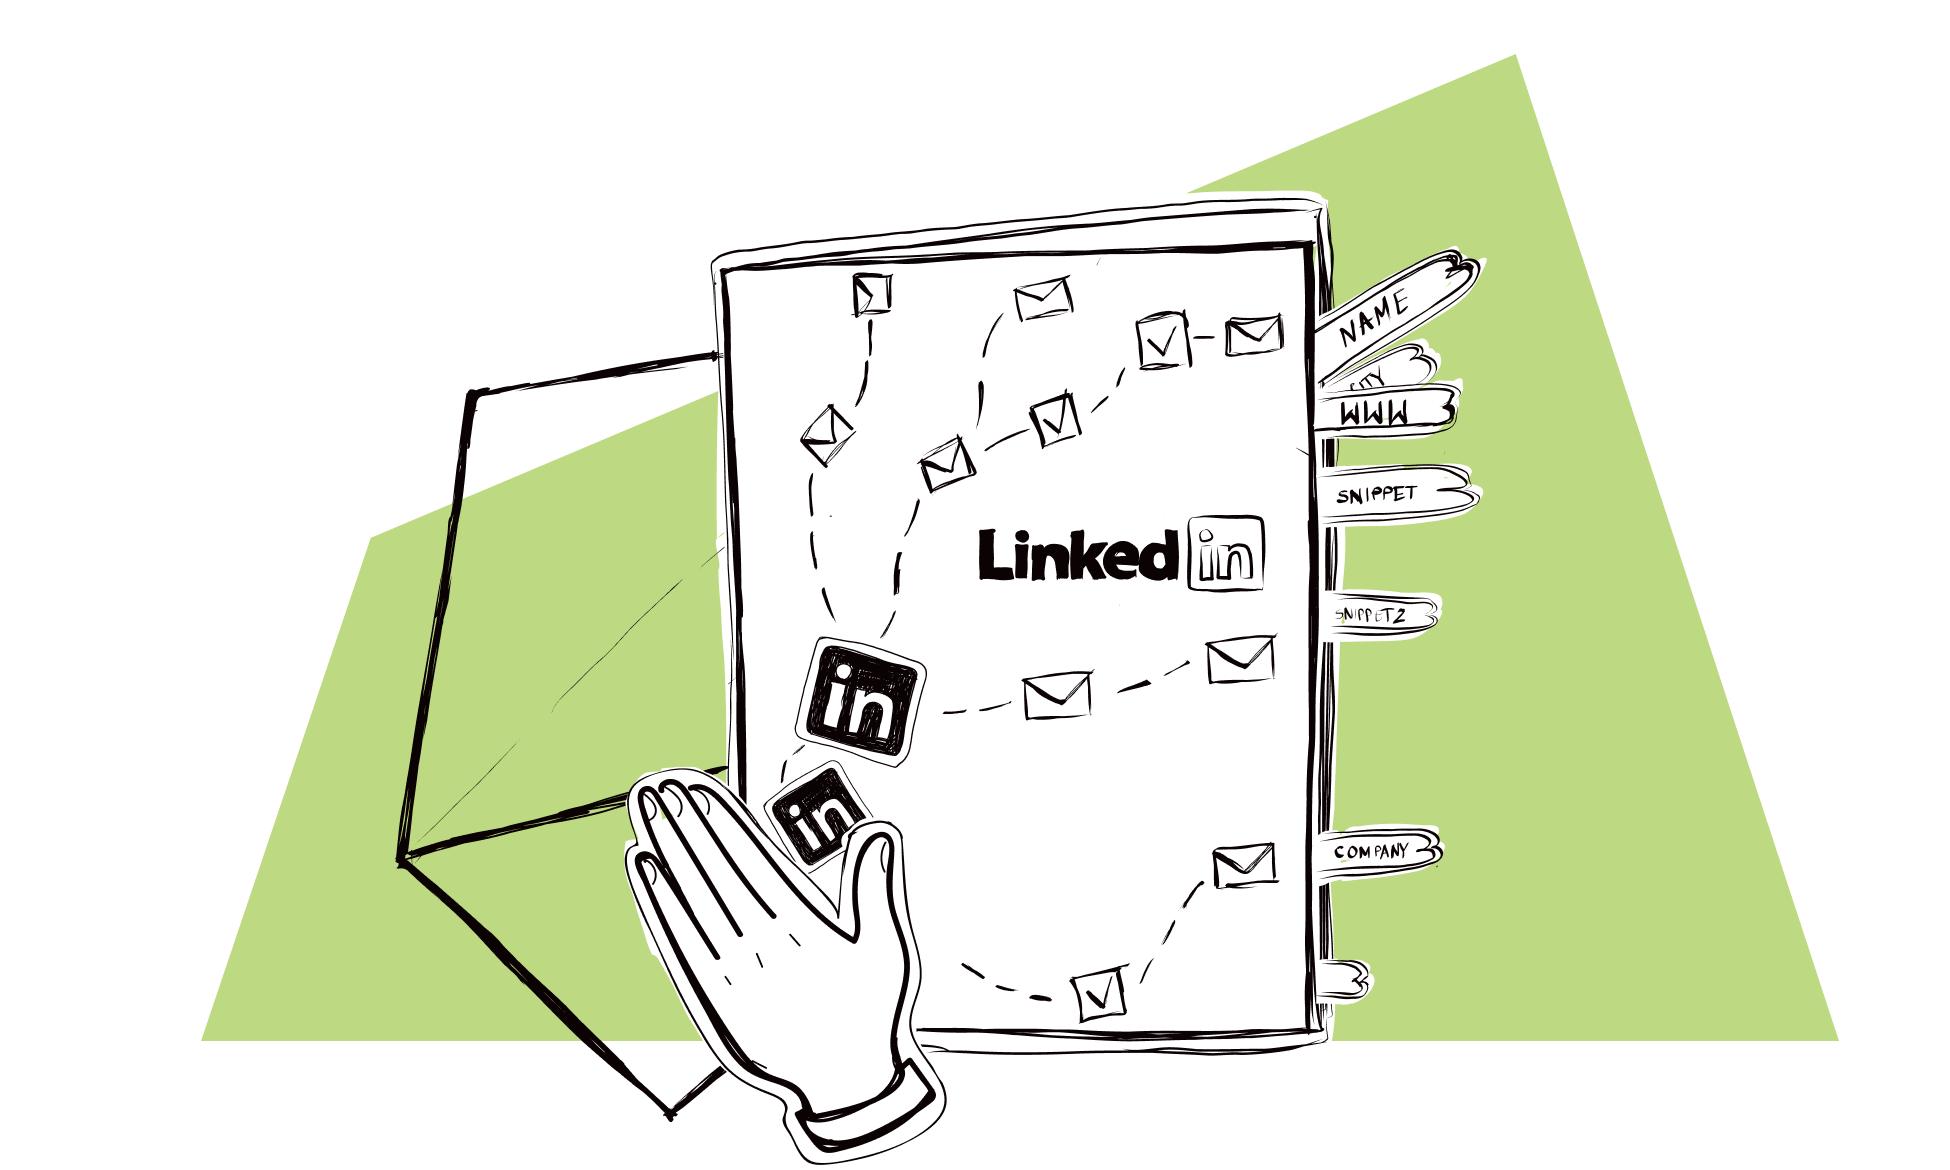 LinkedIn - cold outreach